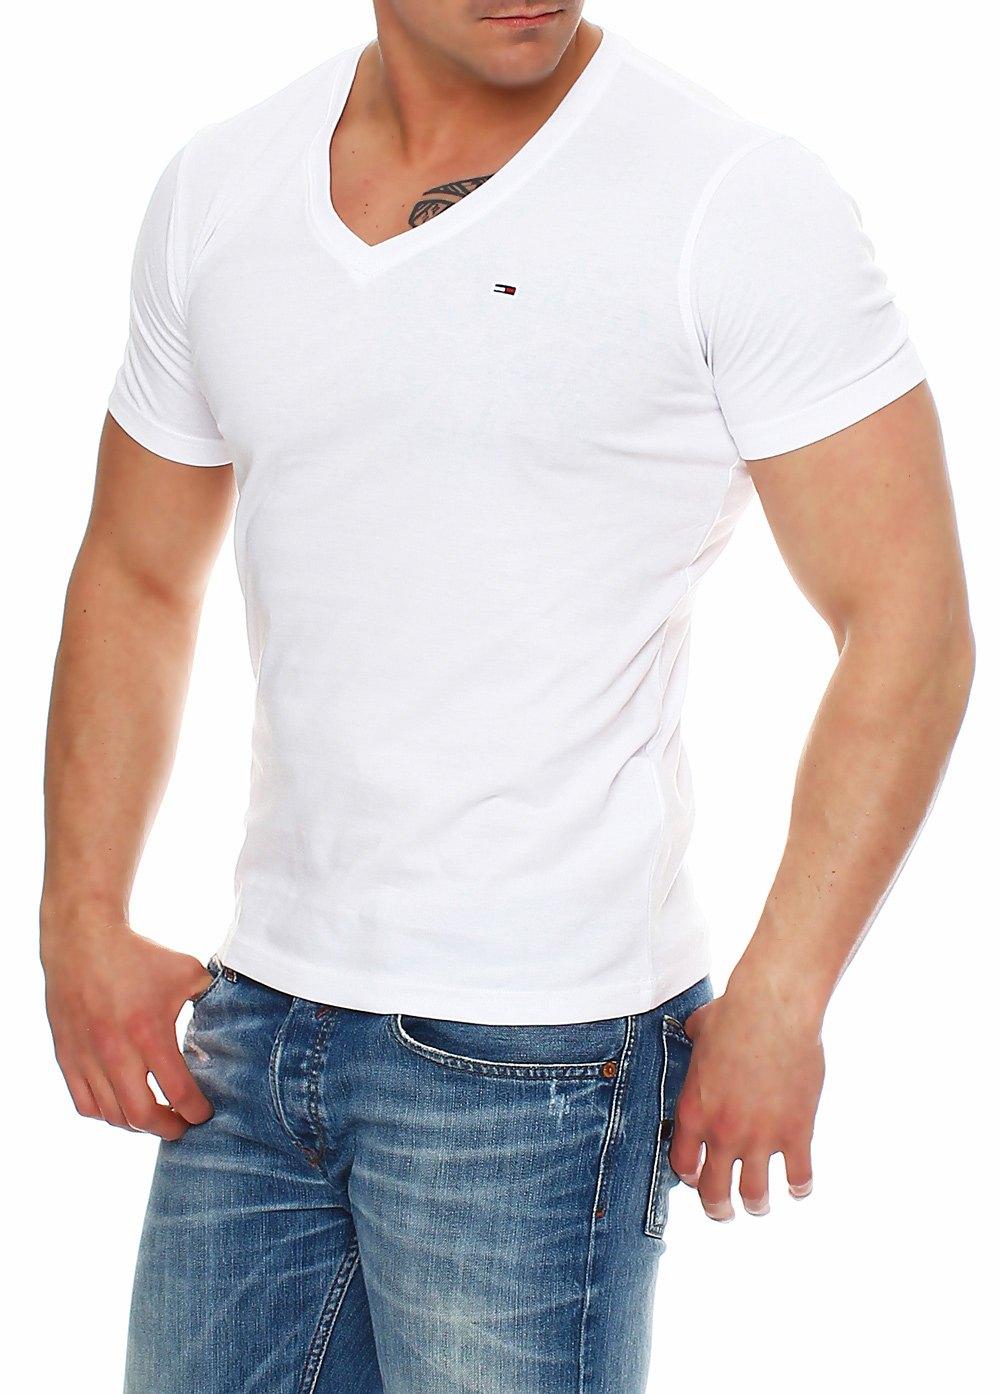 tommy hilfiger denim t shirt shirt v neck tee 1957888835 s m l xl xxl. Black Bedroom Furniture Sets. Home Design Ideas